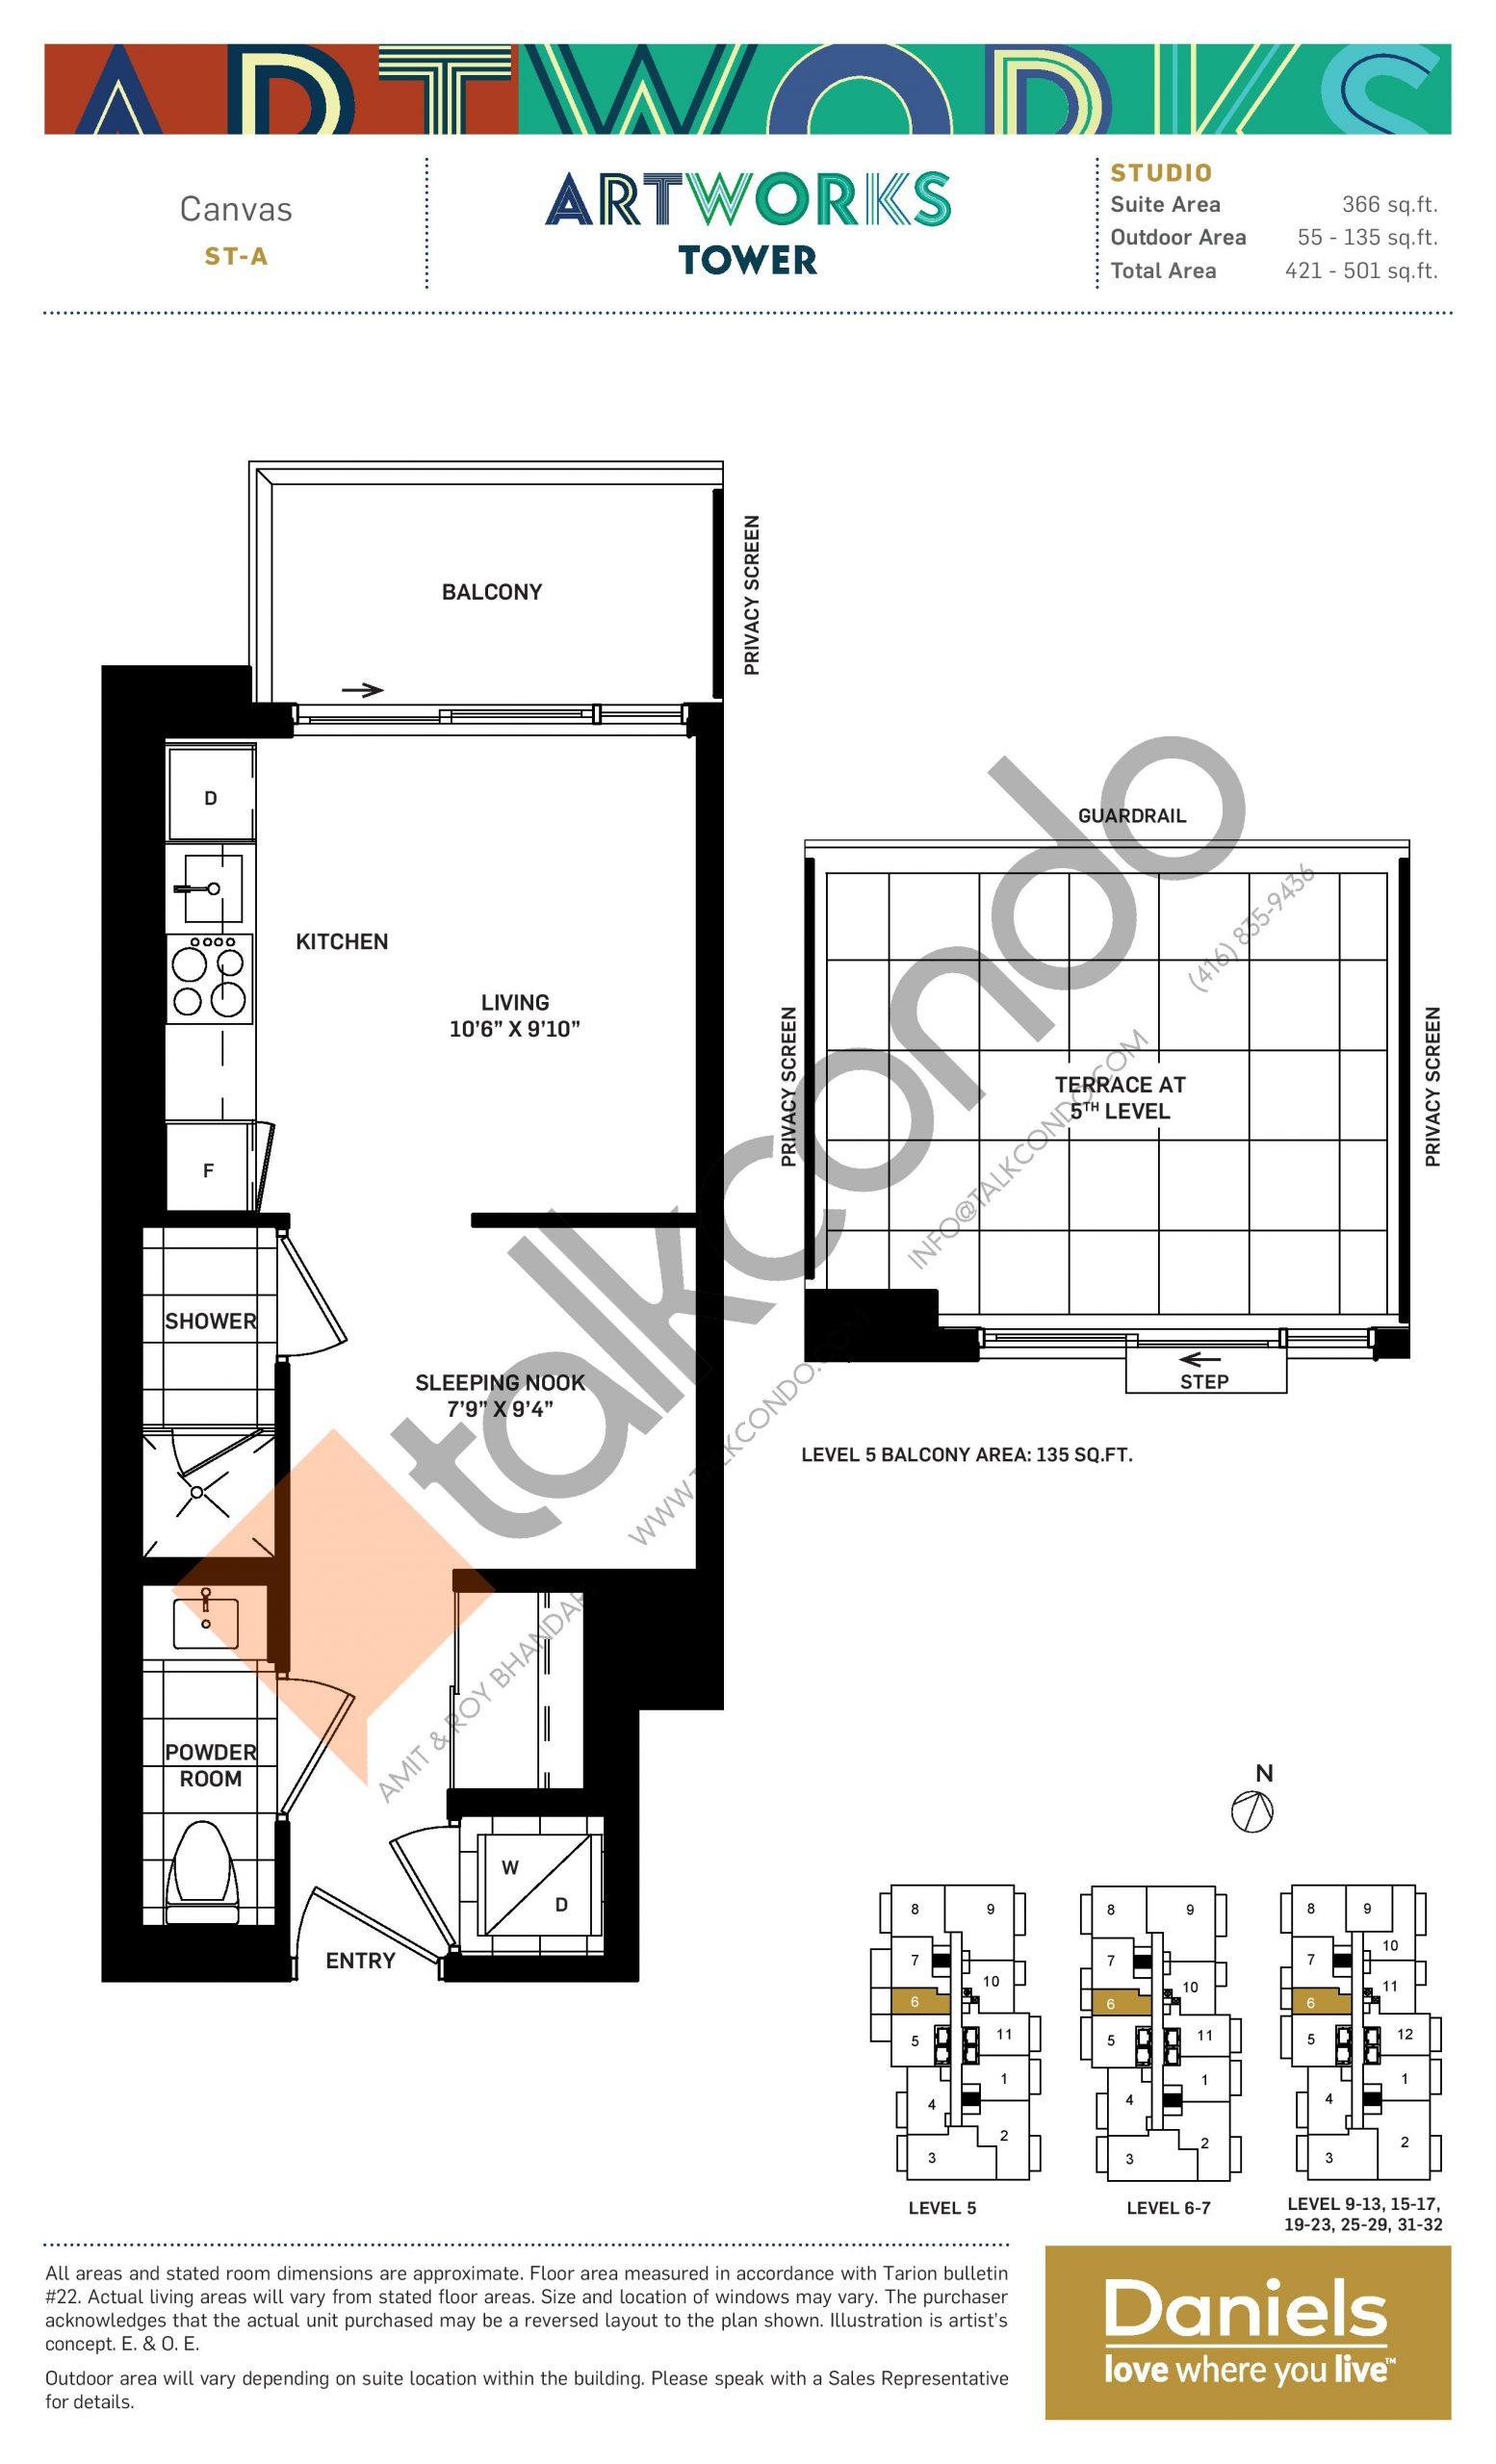 Canvas Floor Plan at Artworks Tower Condos - 366 sq.ft